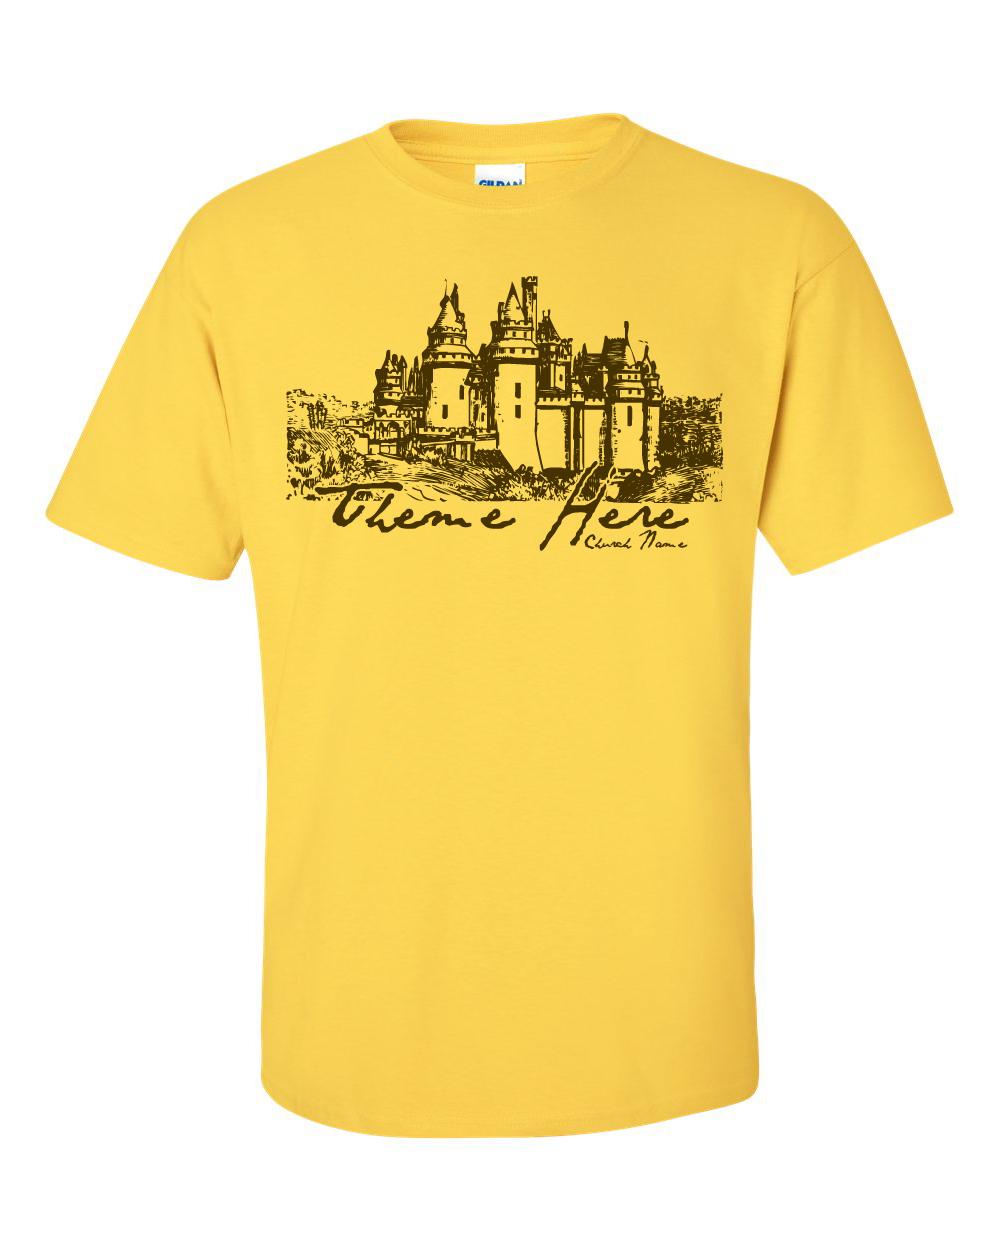 Castle 4-02.jpg